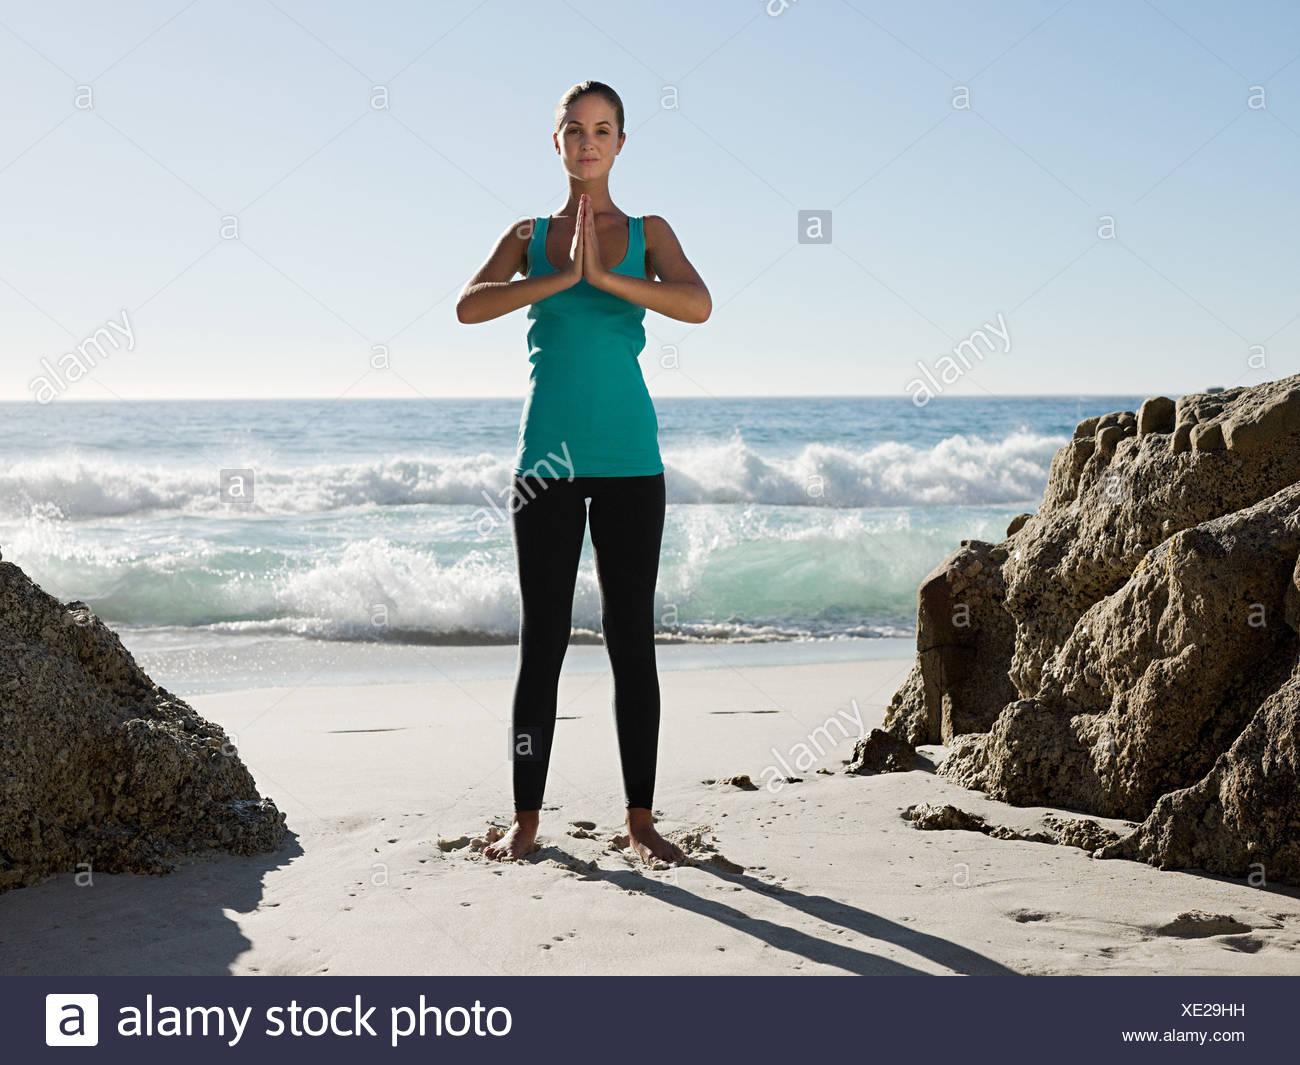 Young woman doing yoga on beach Stock Photo